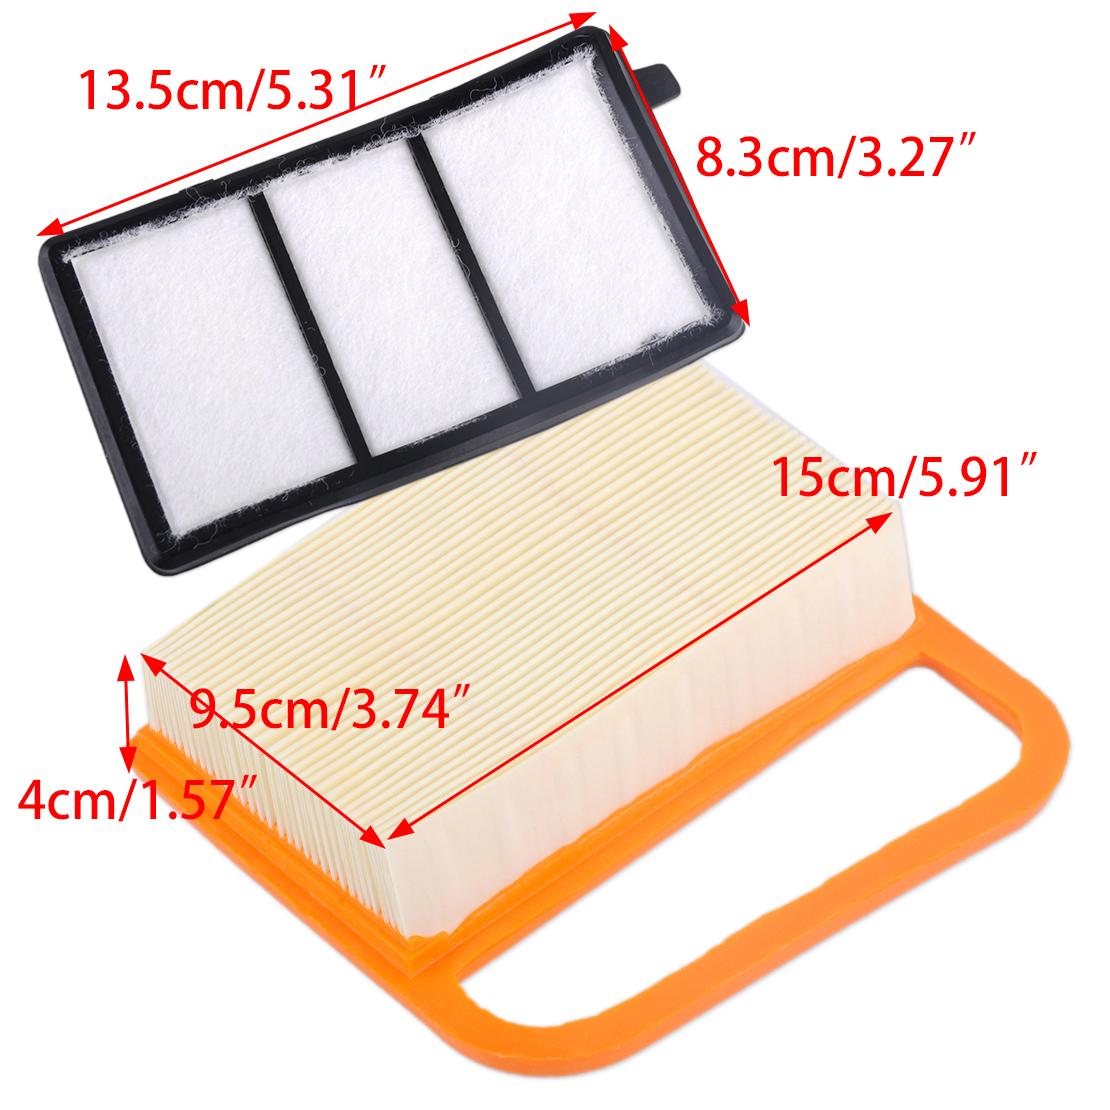 TS420 Air Filter for Stihl Parts TS410 TS480 TS500i W// Pre Filter 4238 141 0300